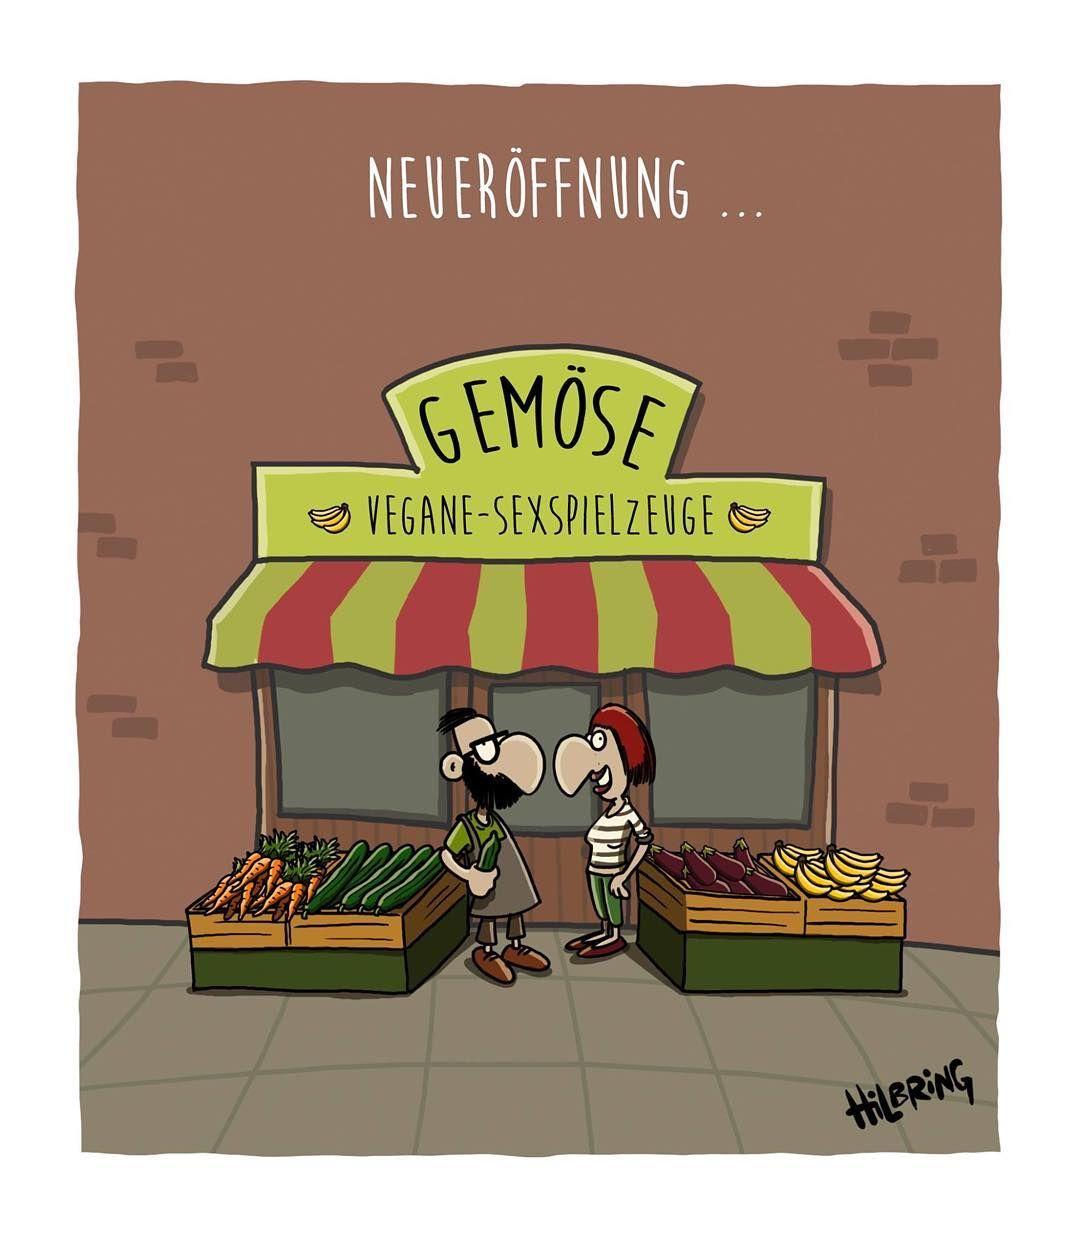 Huhu flacher Freitag! #flachwitze #flacherfreitag #flachwitz #vegan #sextoy #gemüse #oli #hilbring #cartoon #lustig by oliscartoons #veganhumor